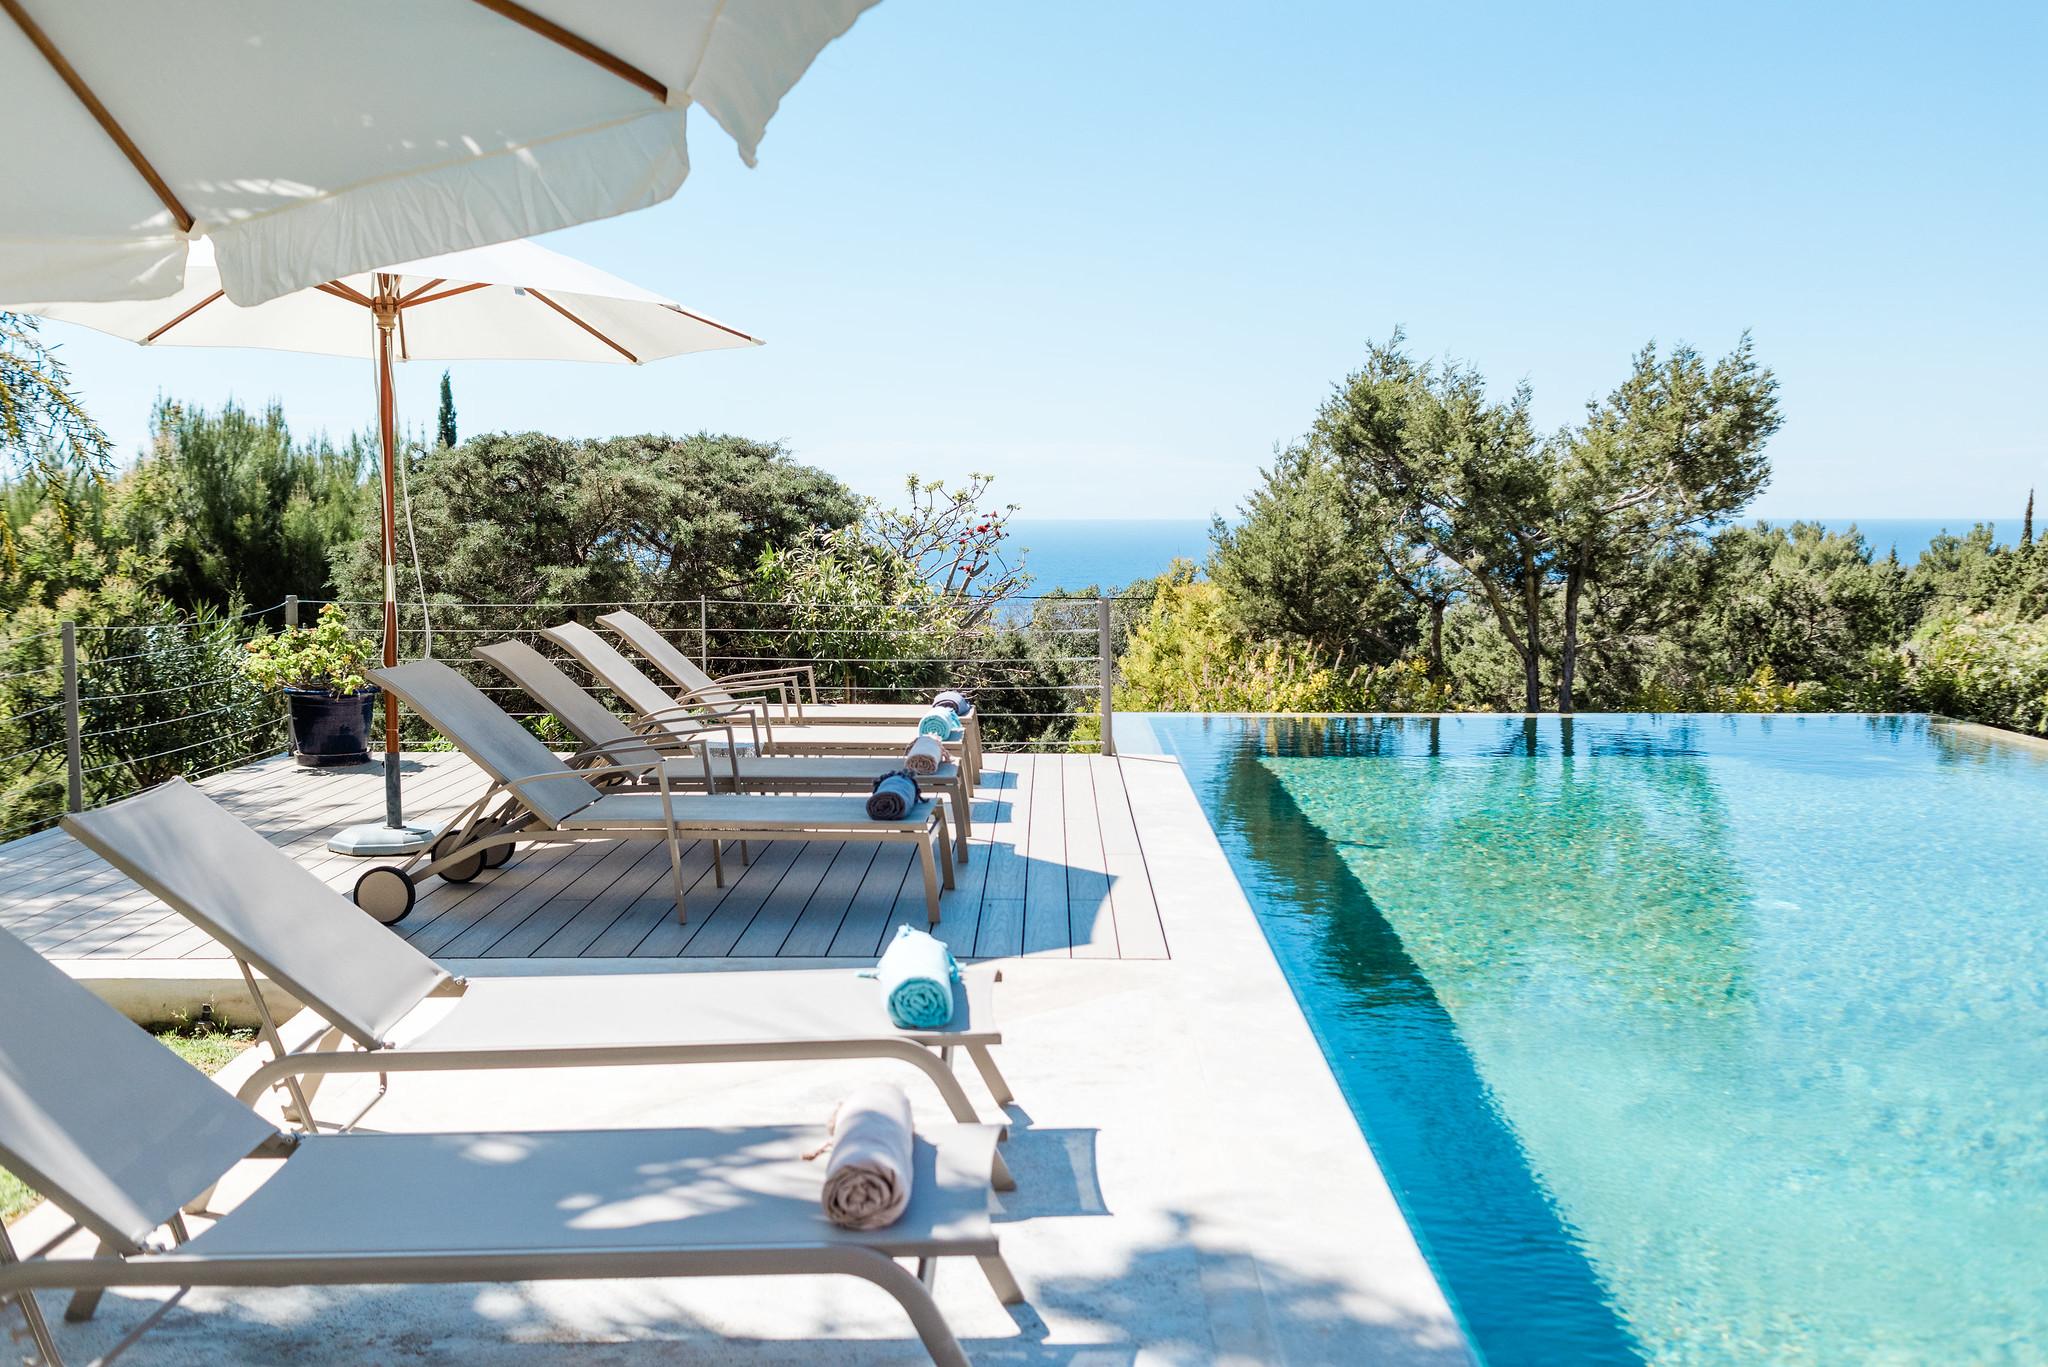 https://www.white-ibiza.com/wp-content/uploads/2020/06/white-ibiza-villas-casa-nyah-exterior-poolside.jpg